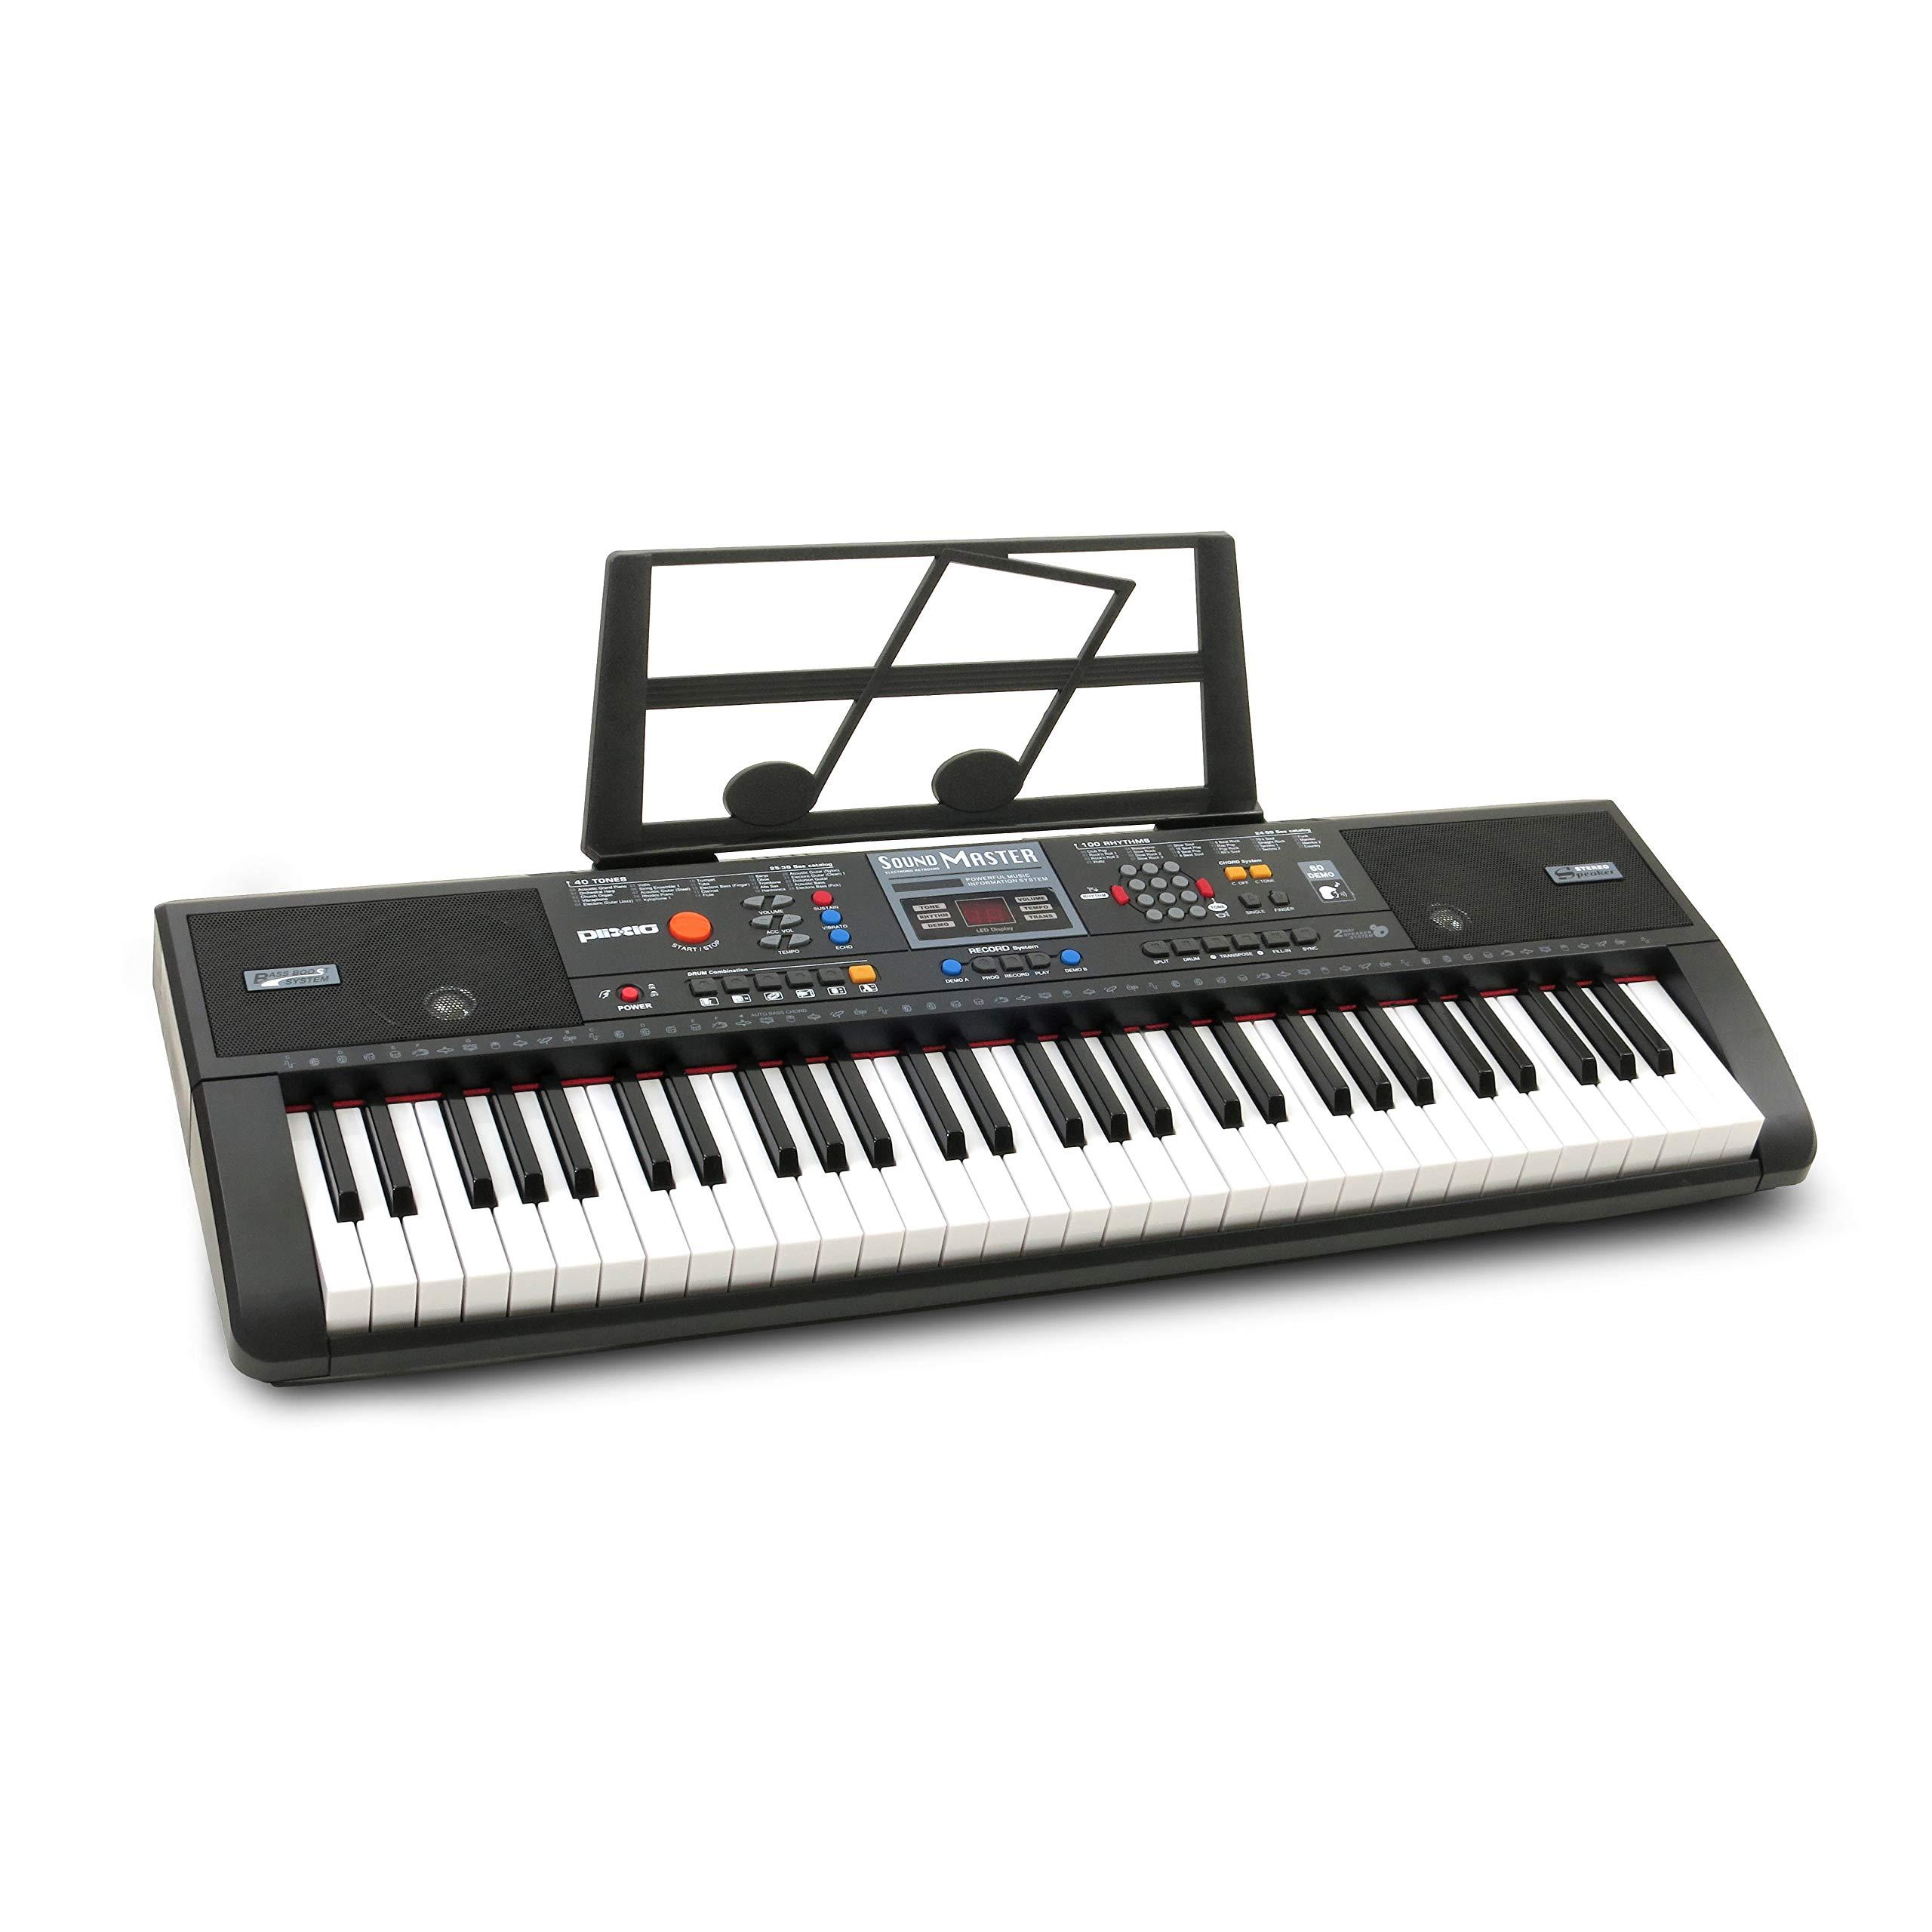 Plixio 61-Key Digital Electric Piano Keyboard & Sheet Music Stand - Portable Electronic Keyboard for Beginners (Kids & Adults) by Plixio